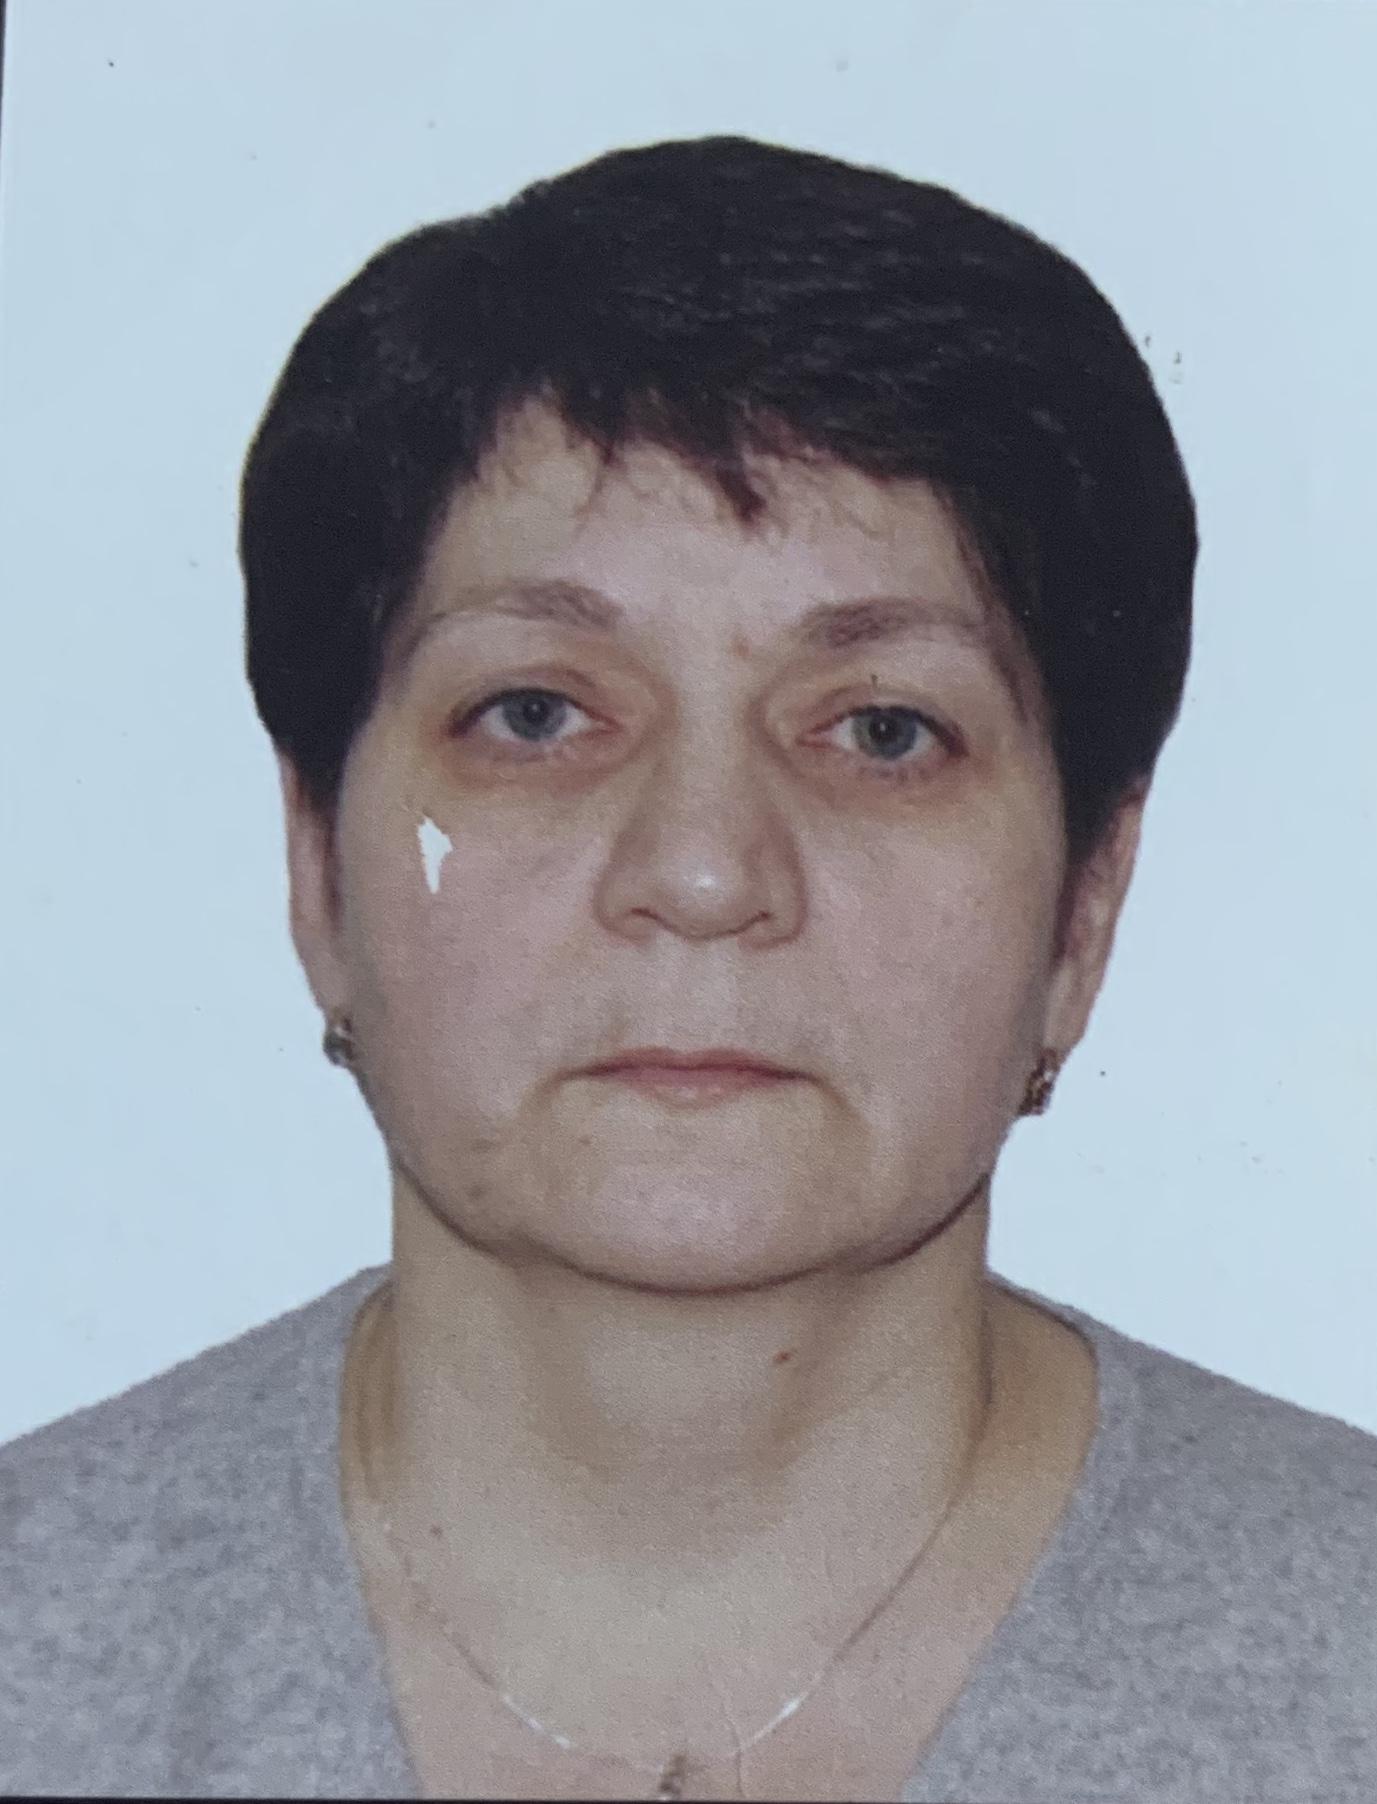 Султанова Татьяна Николаевна